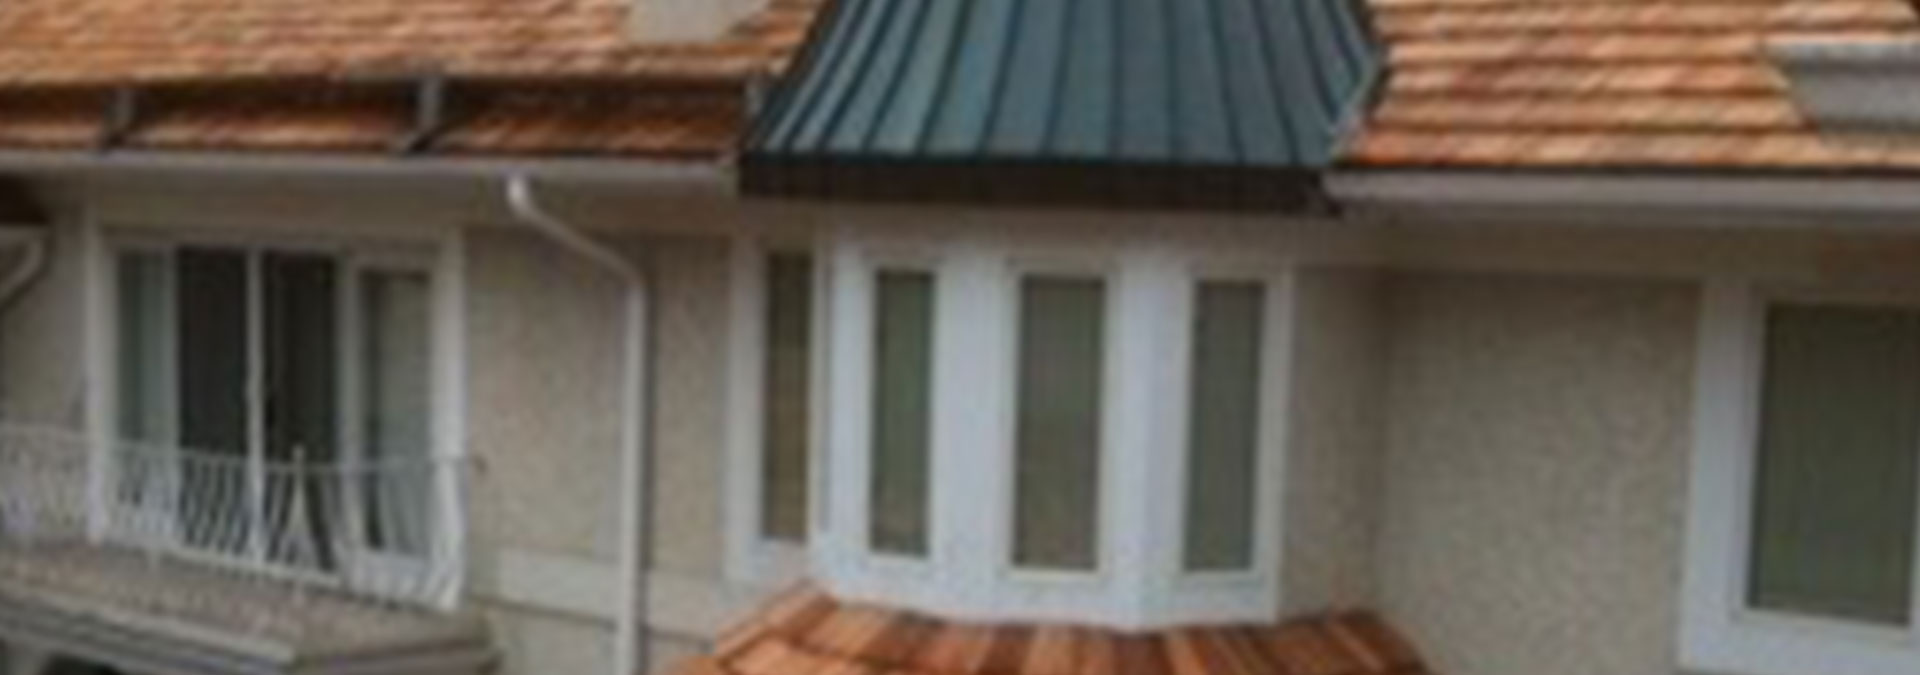 Fletcher Brothers Roofing & Siding - Pennsauken Township Roofer